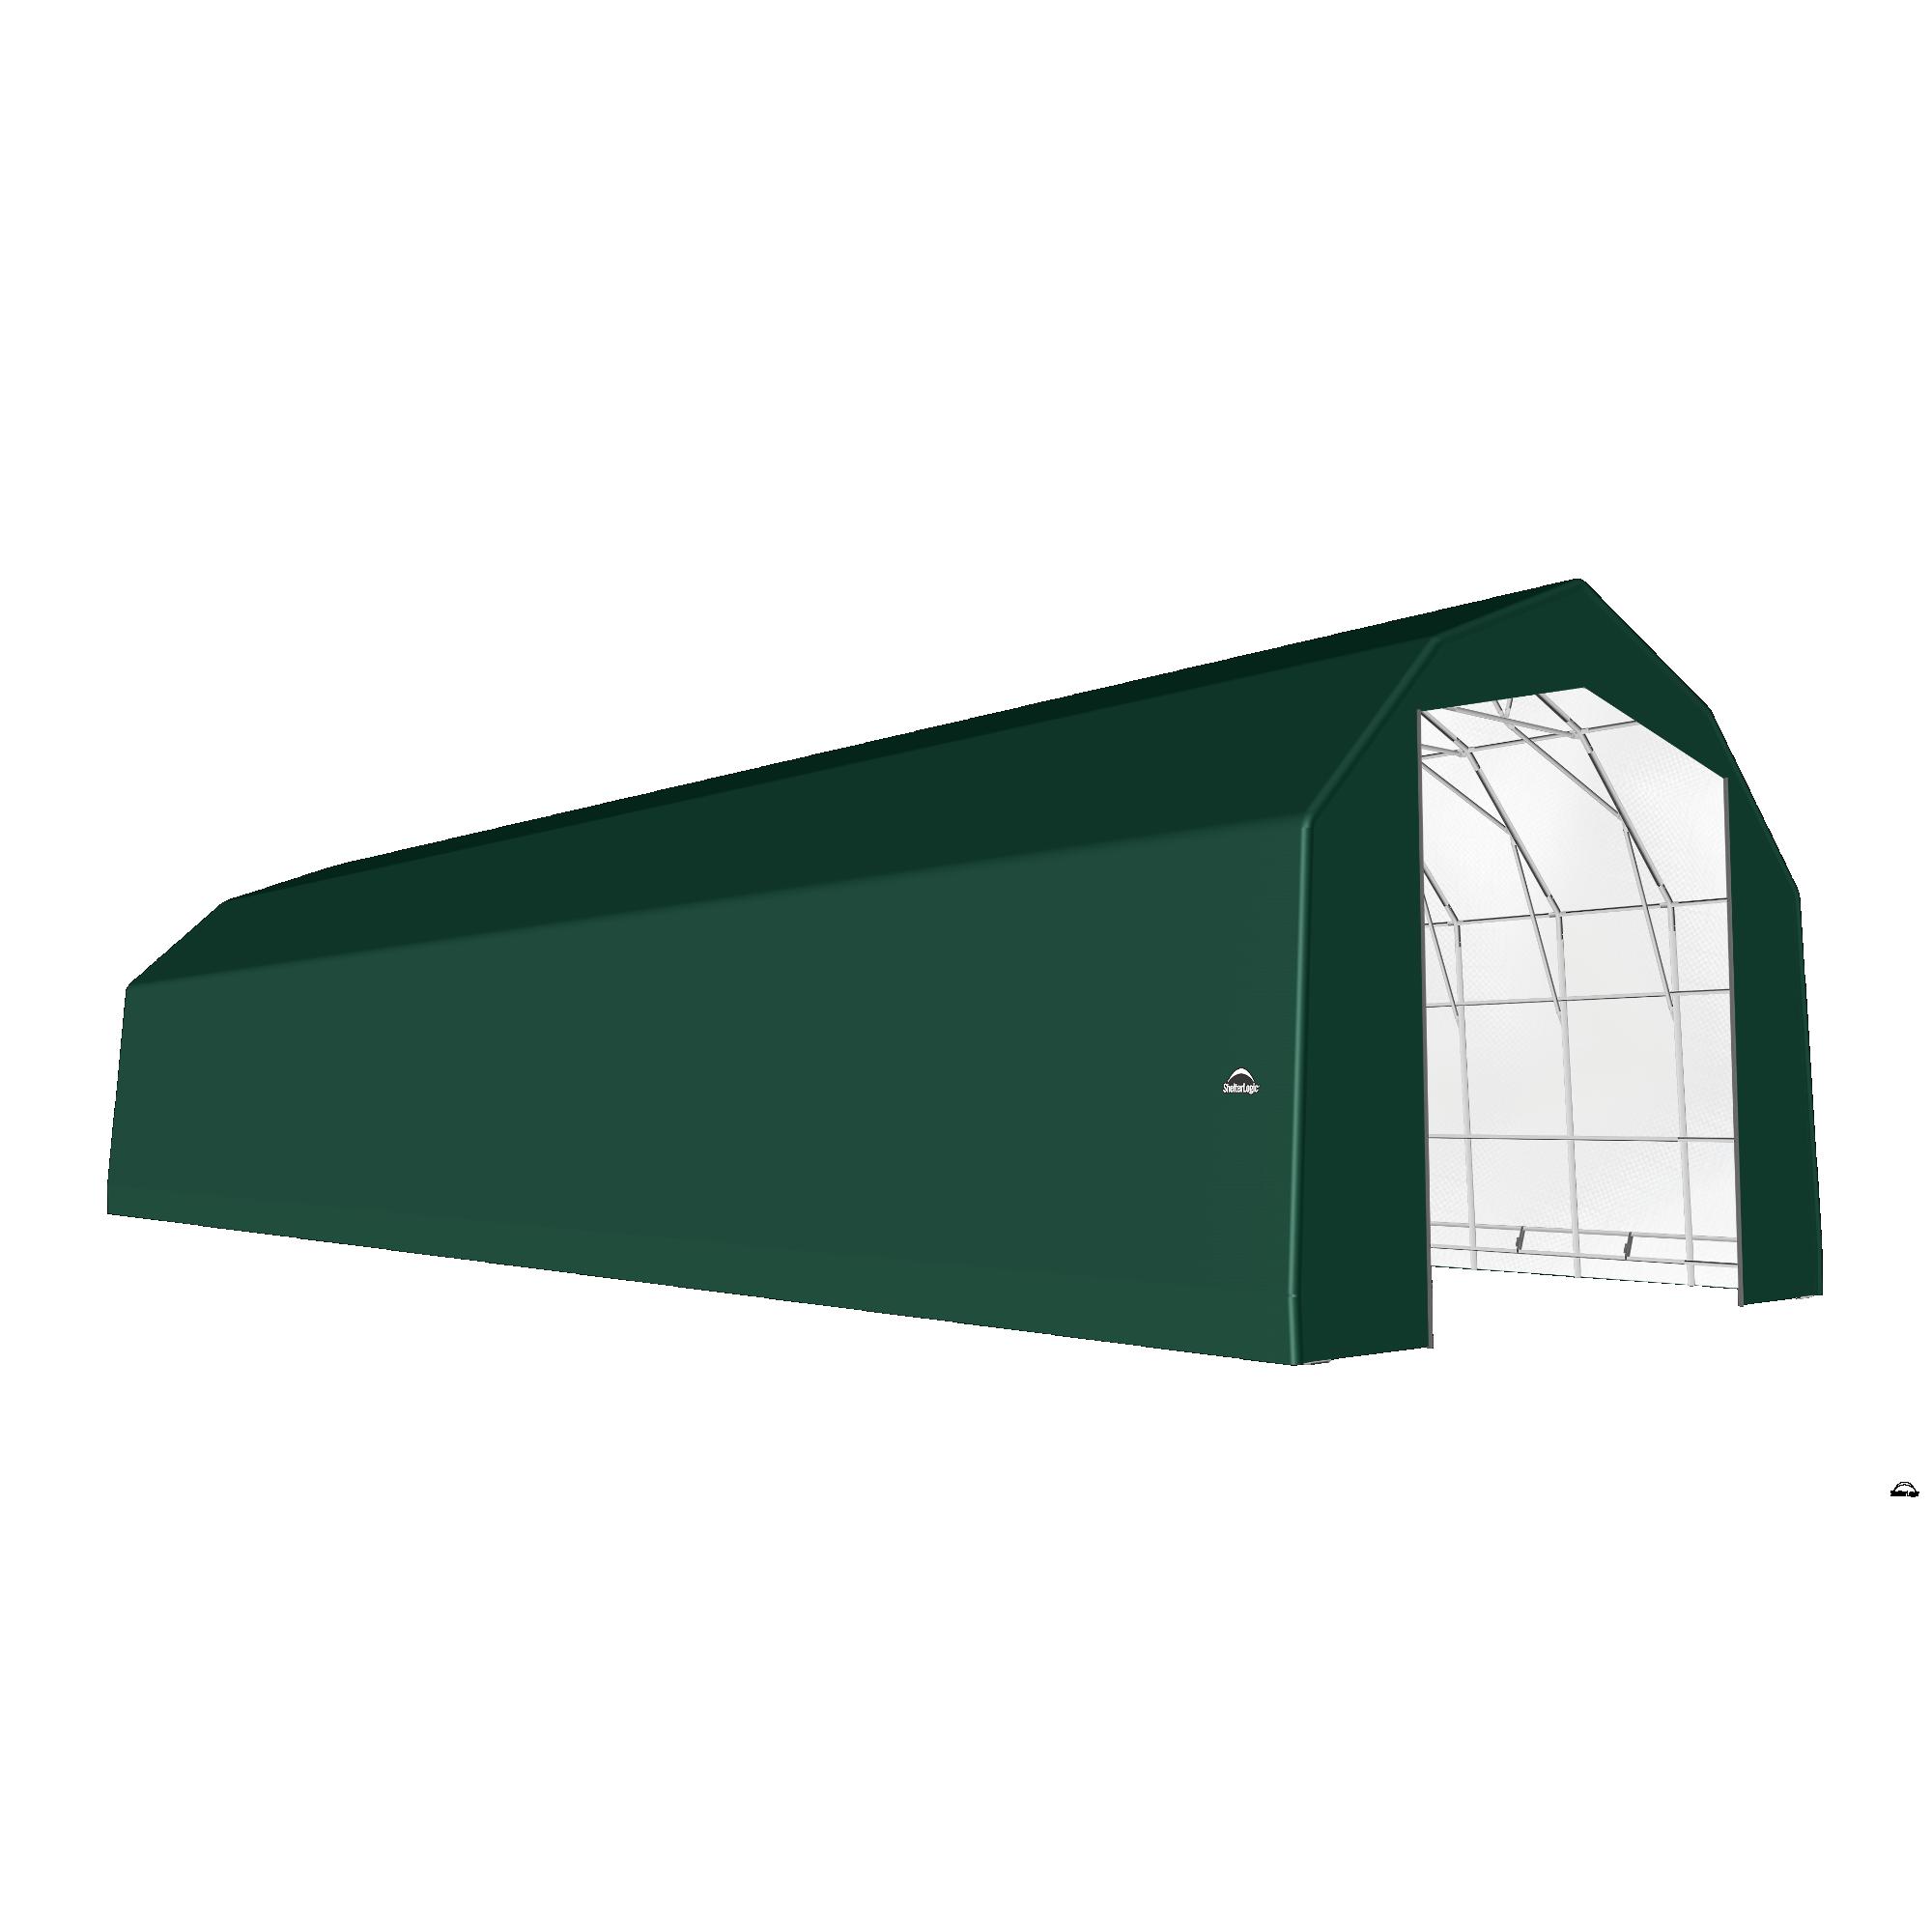 SP Barn 25X88X20 Green 14 oz PE Shelter